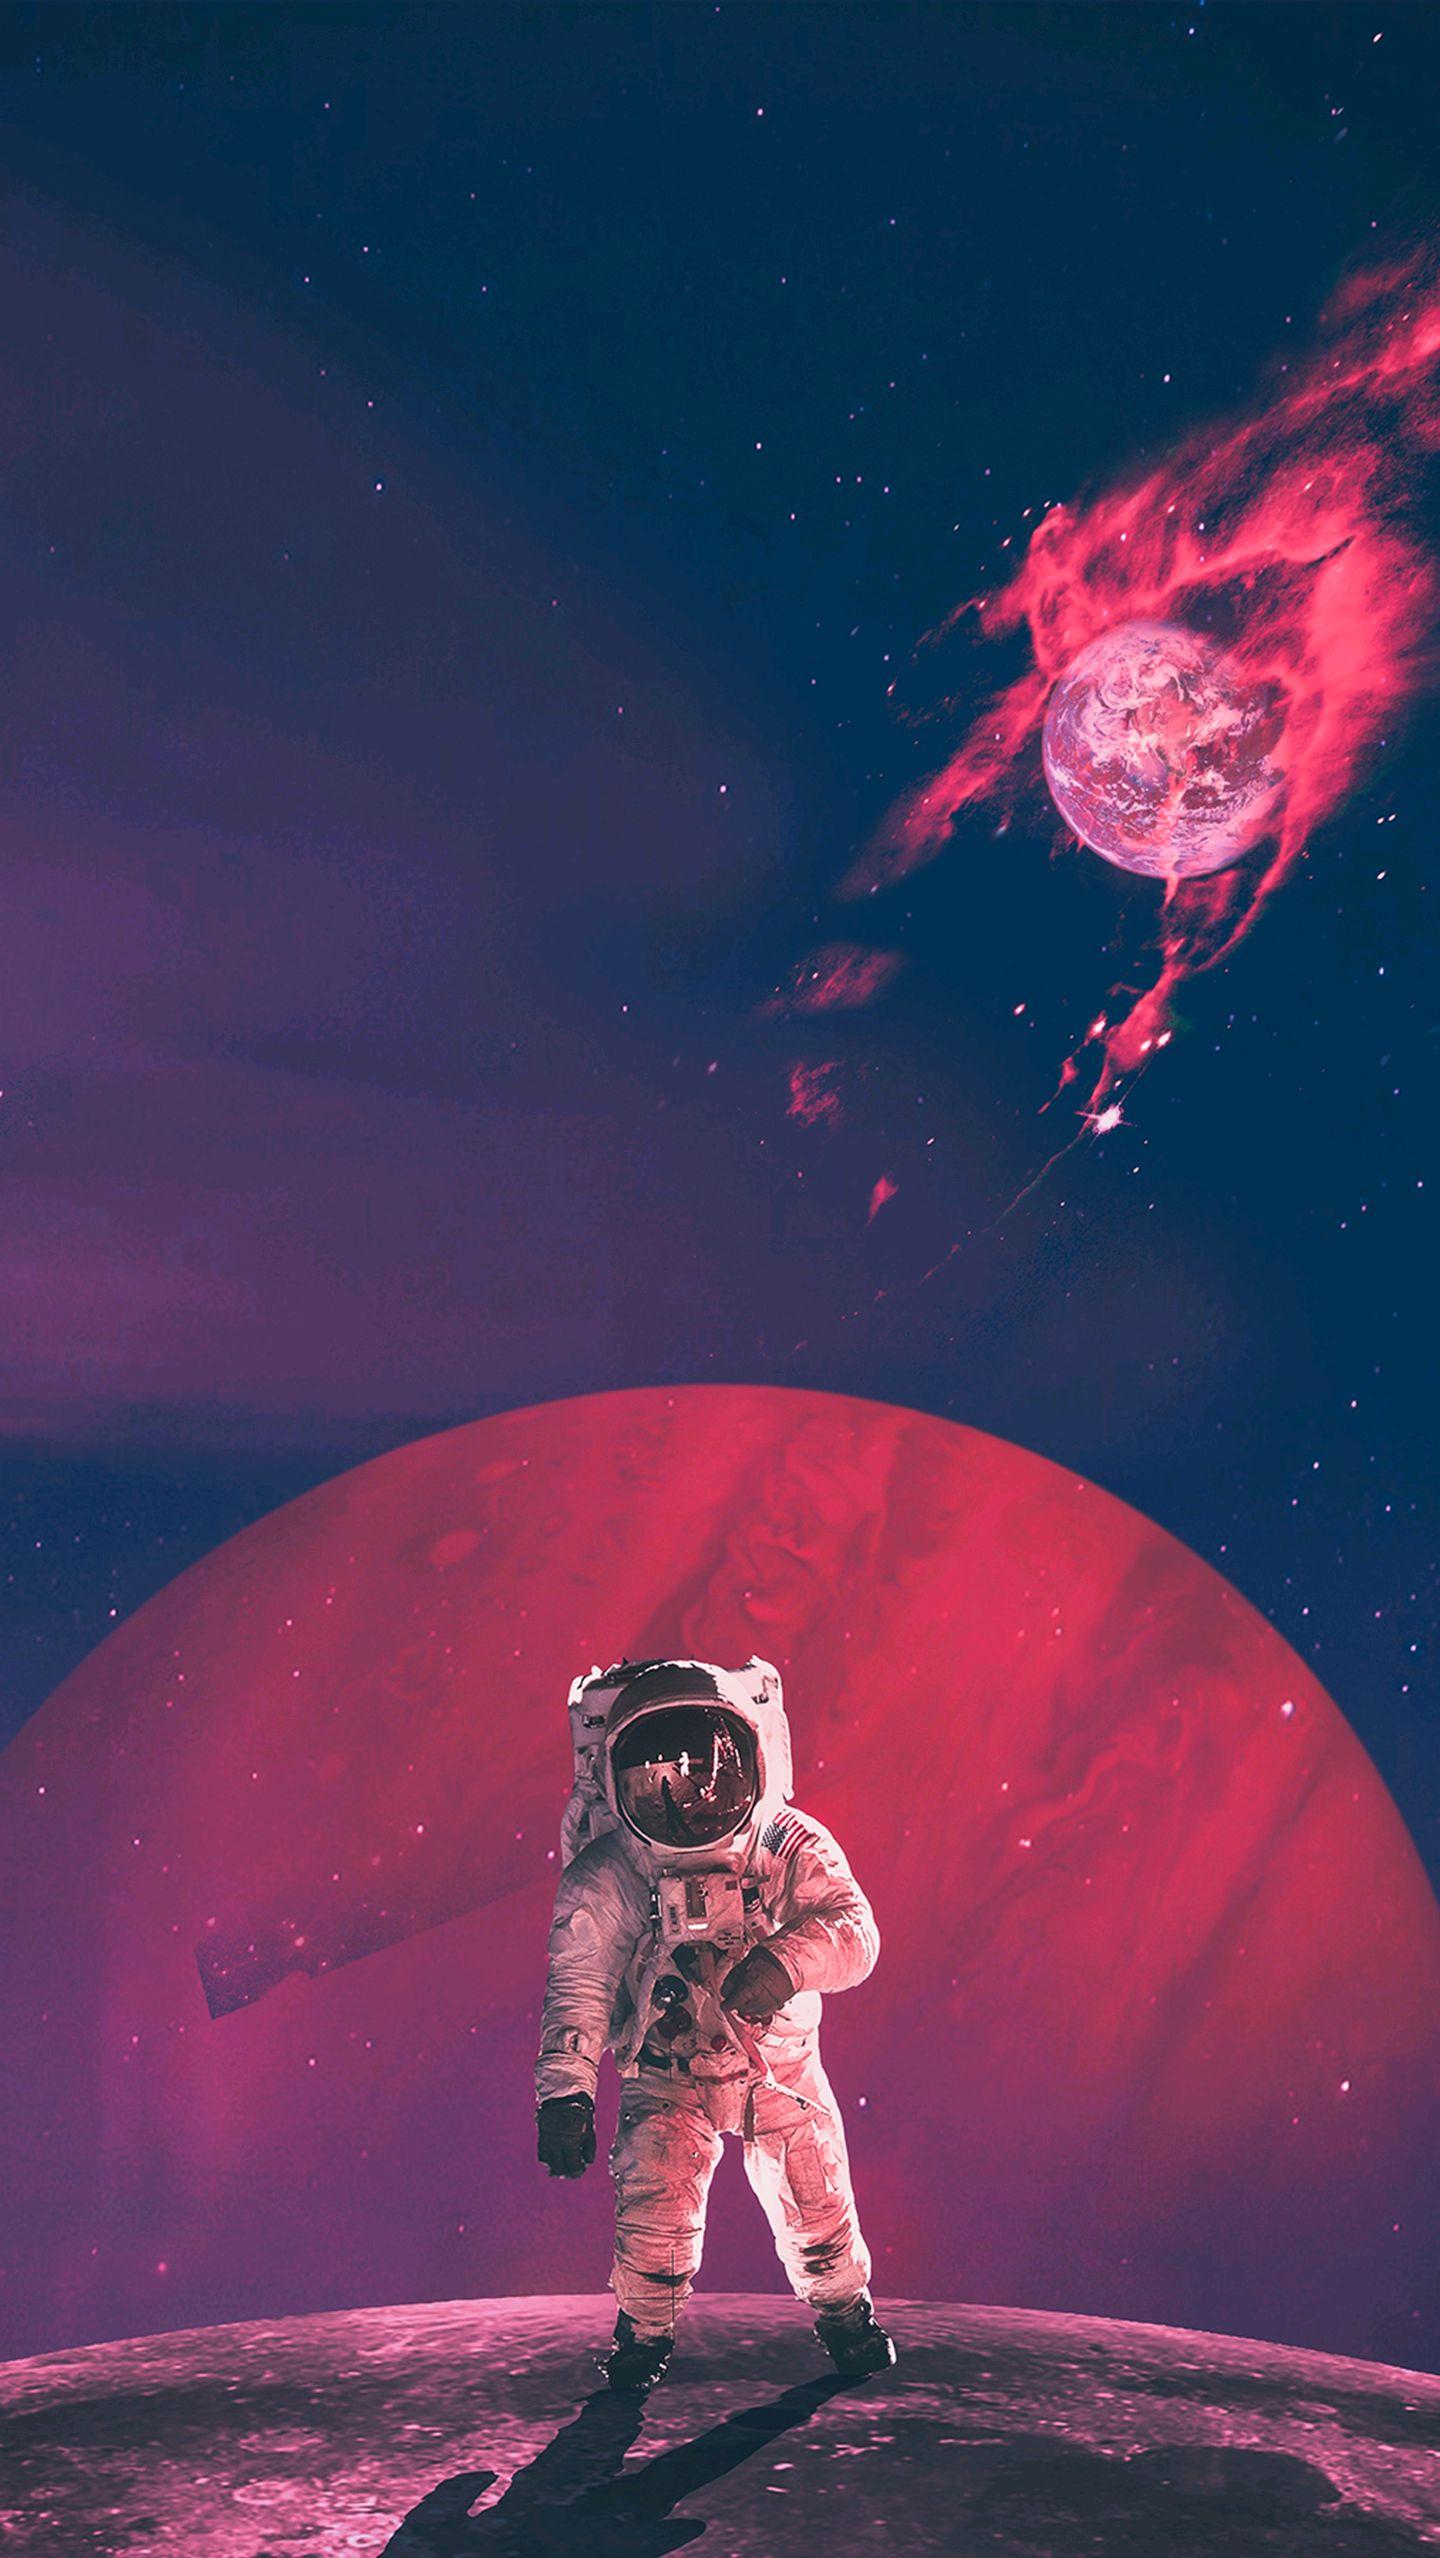 Cute Wallpapers For Girls Desktop Astronaut Artwork Burning Earth Iphone Wallpaper Iphone